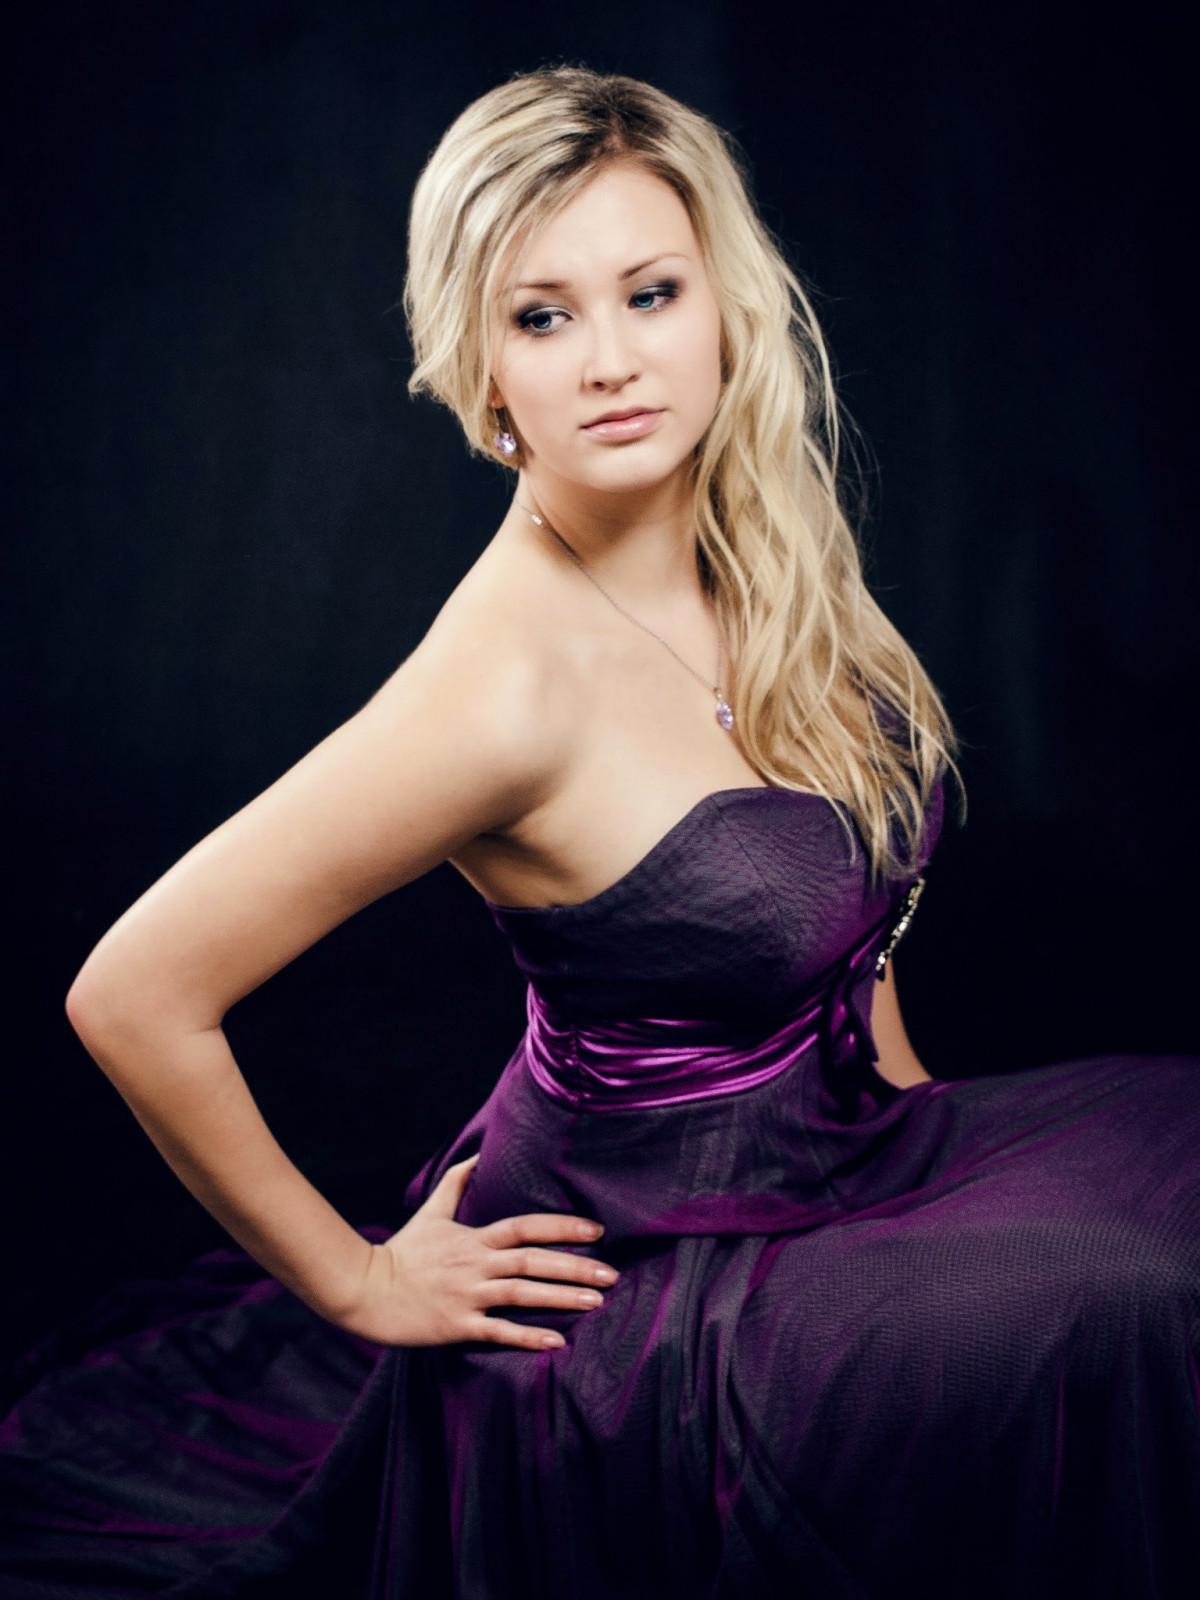 Sexy Blonde Girl Pics